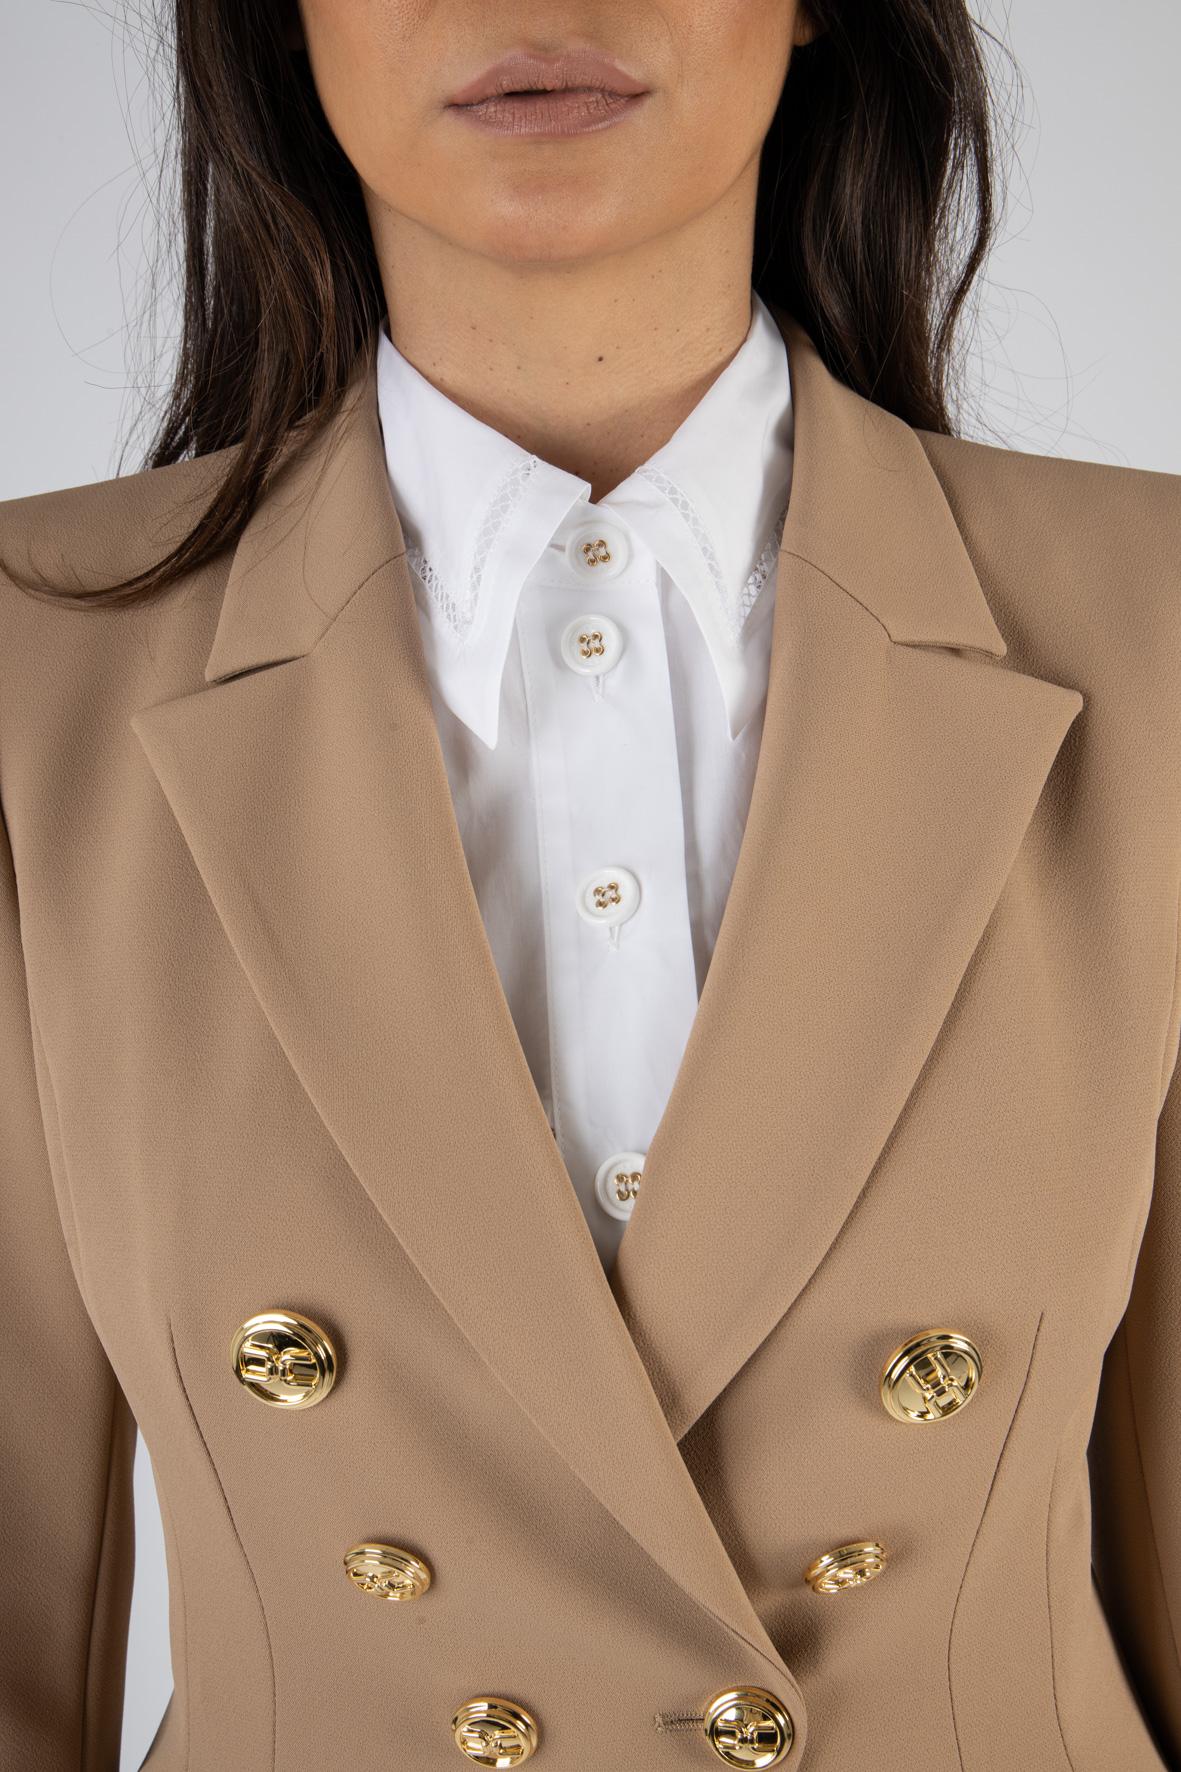 Giacca corta con bottoni oro light ELISABETTA FRANCHI | Giacca | GI97011E2390